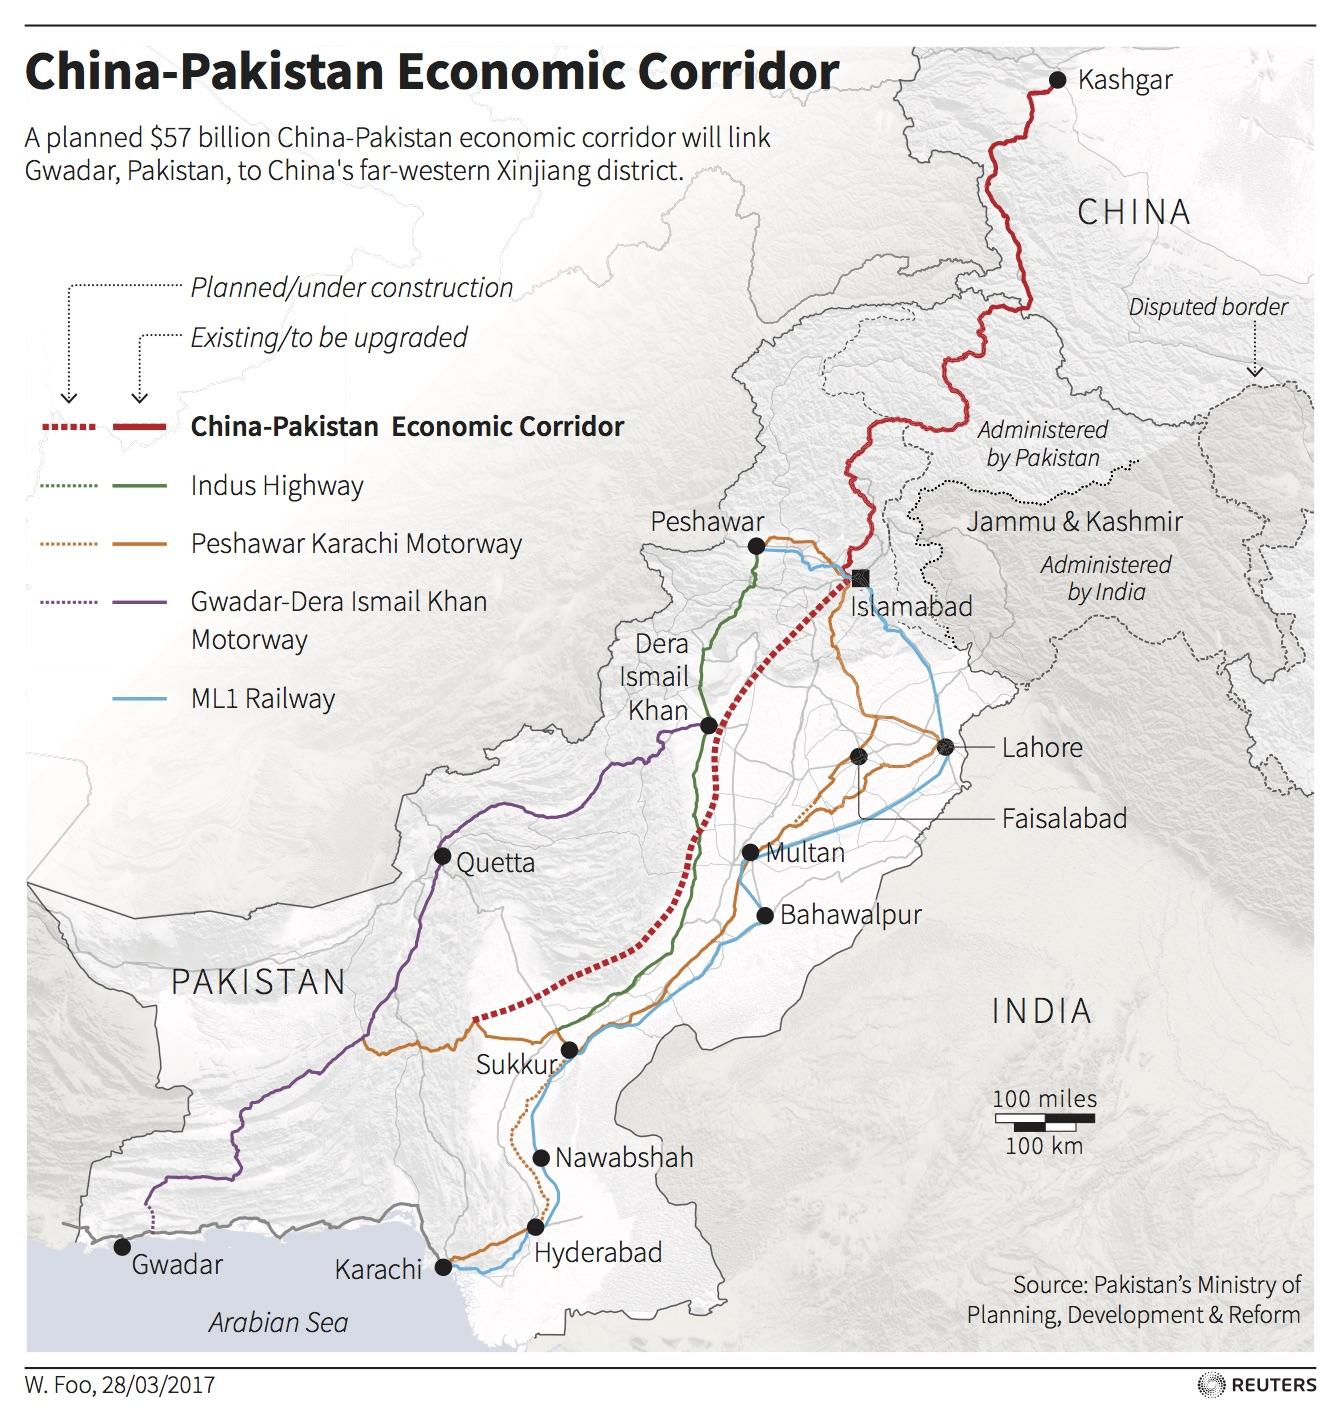 China-Pakistan Economic Corridor.